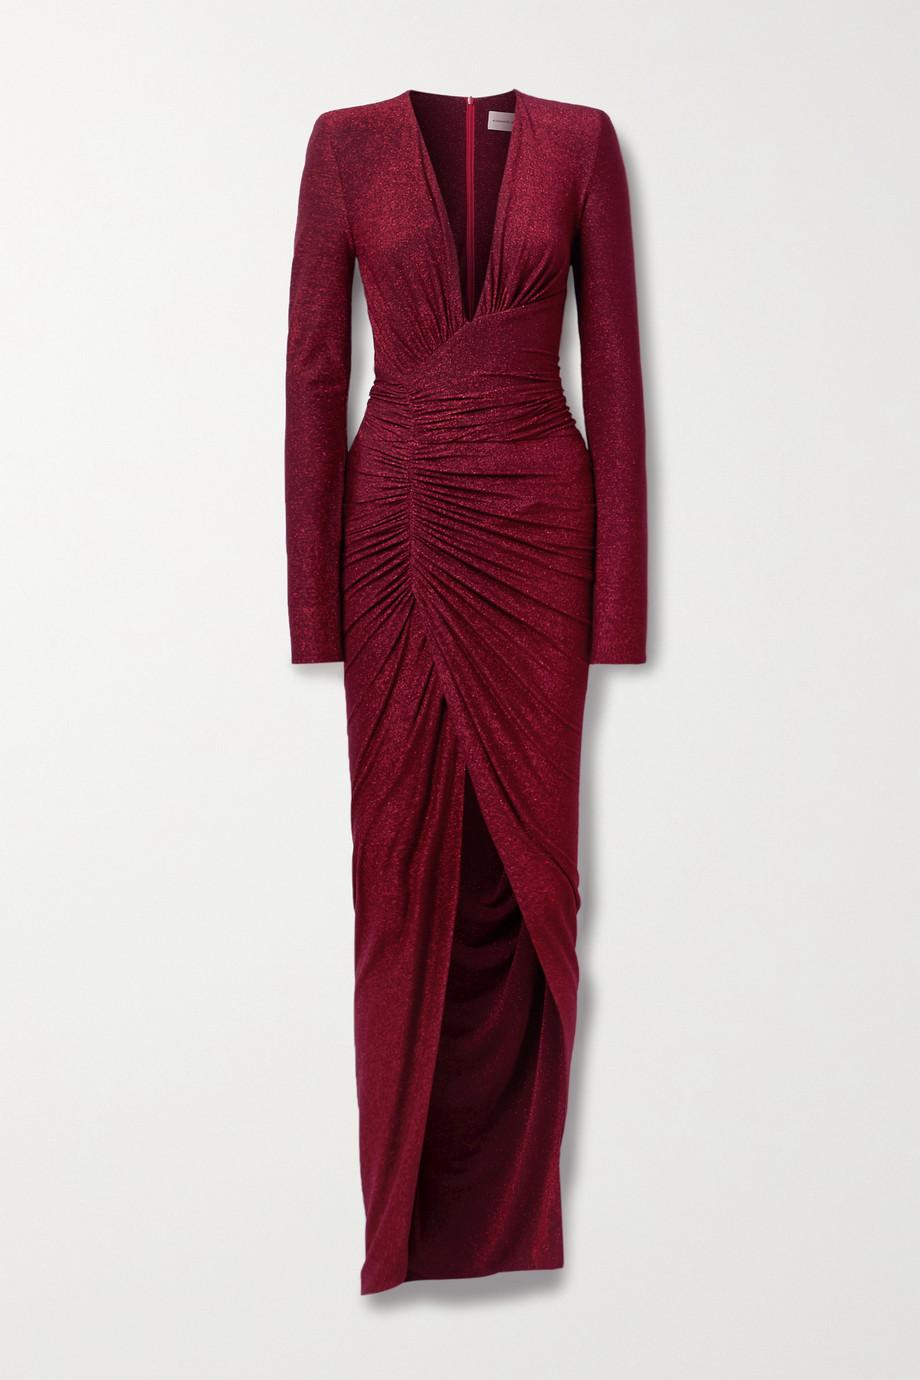 Alexandre Vauthier Asymmetric ruched stretch-Lurex gown